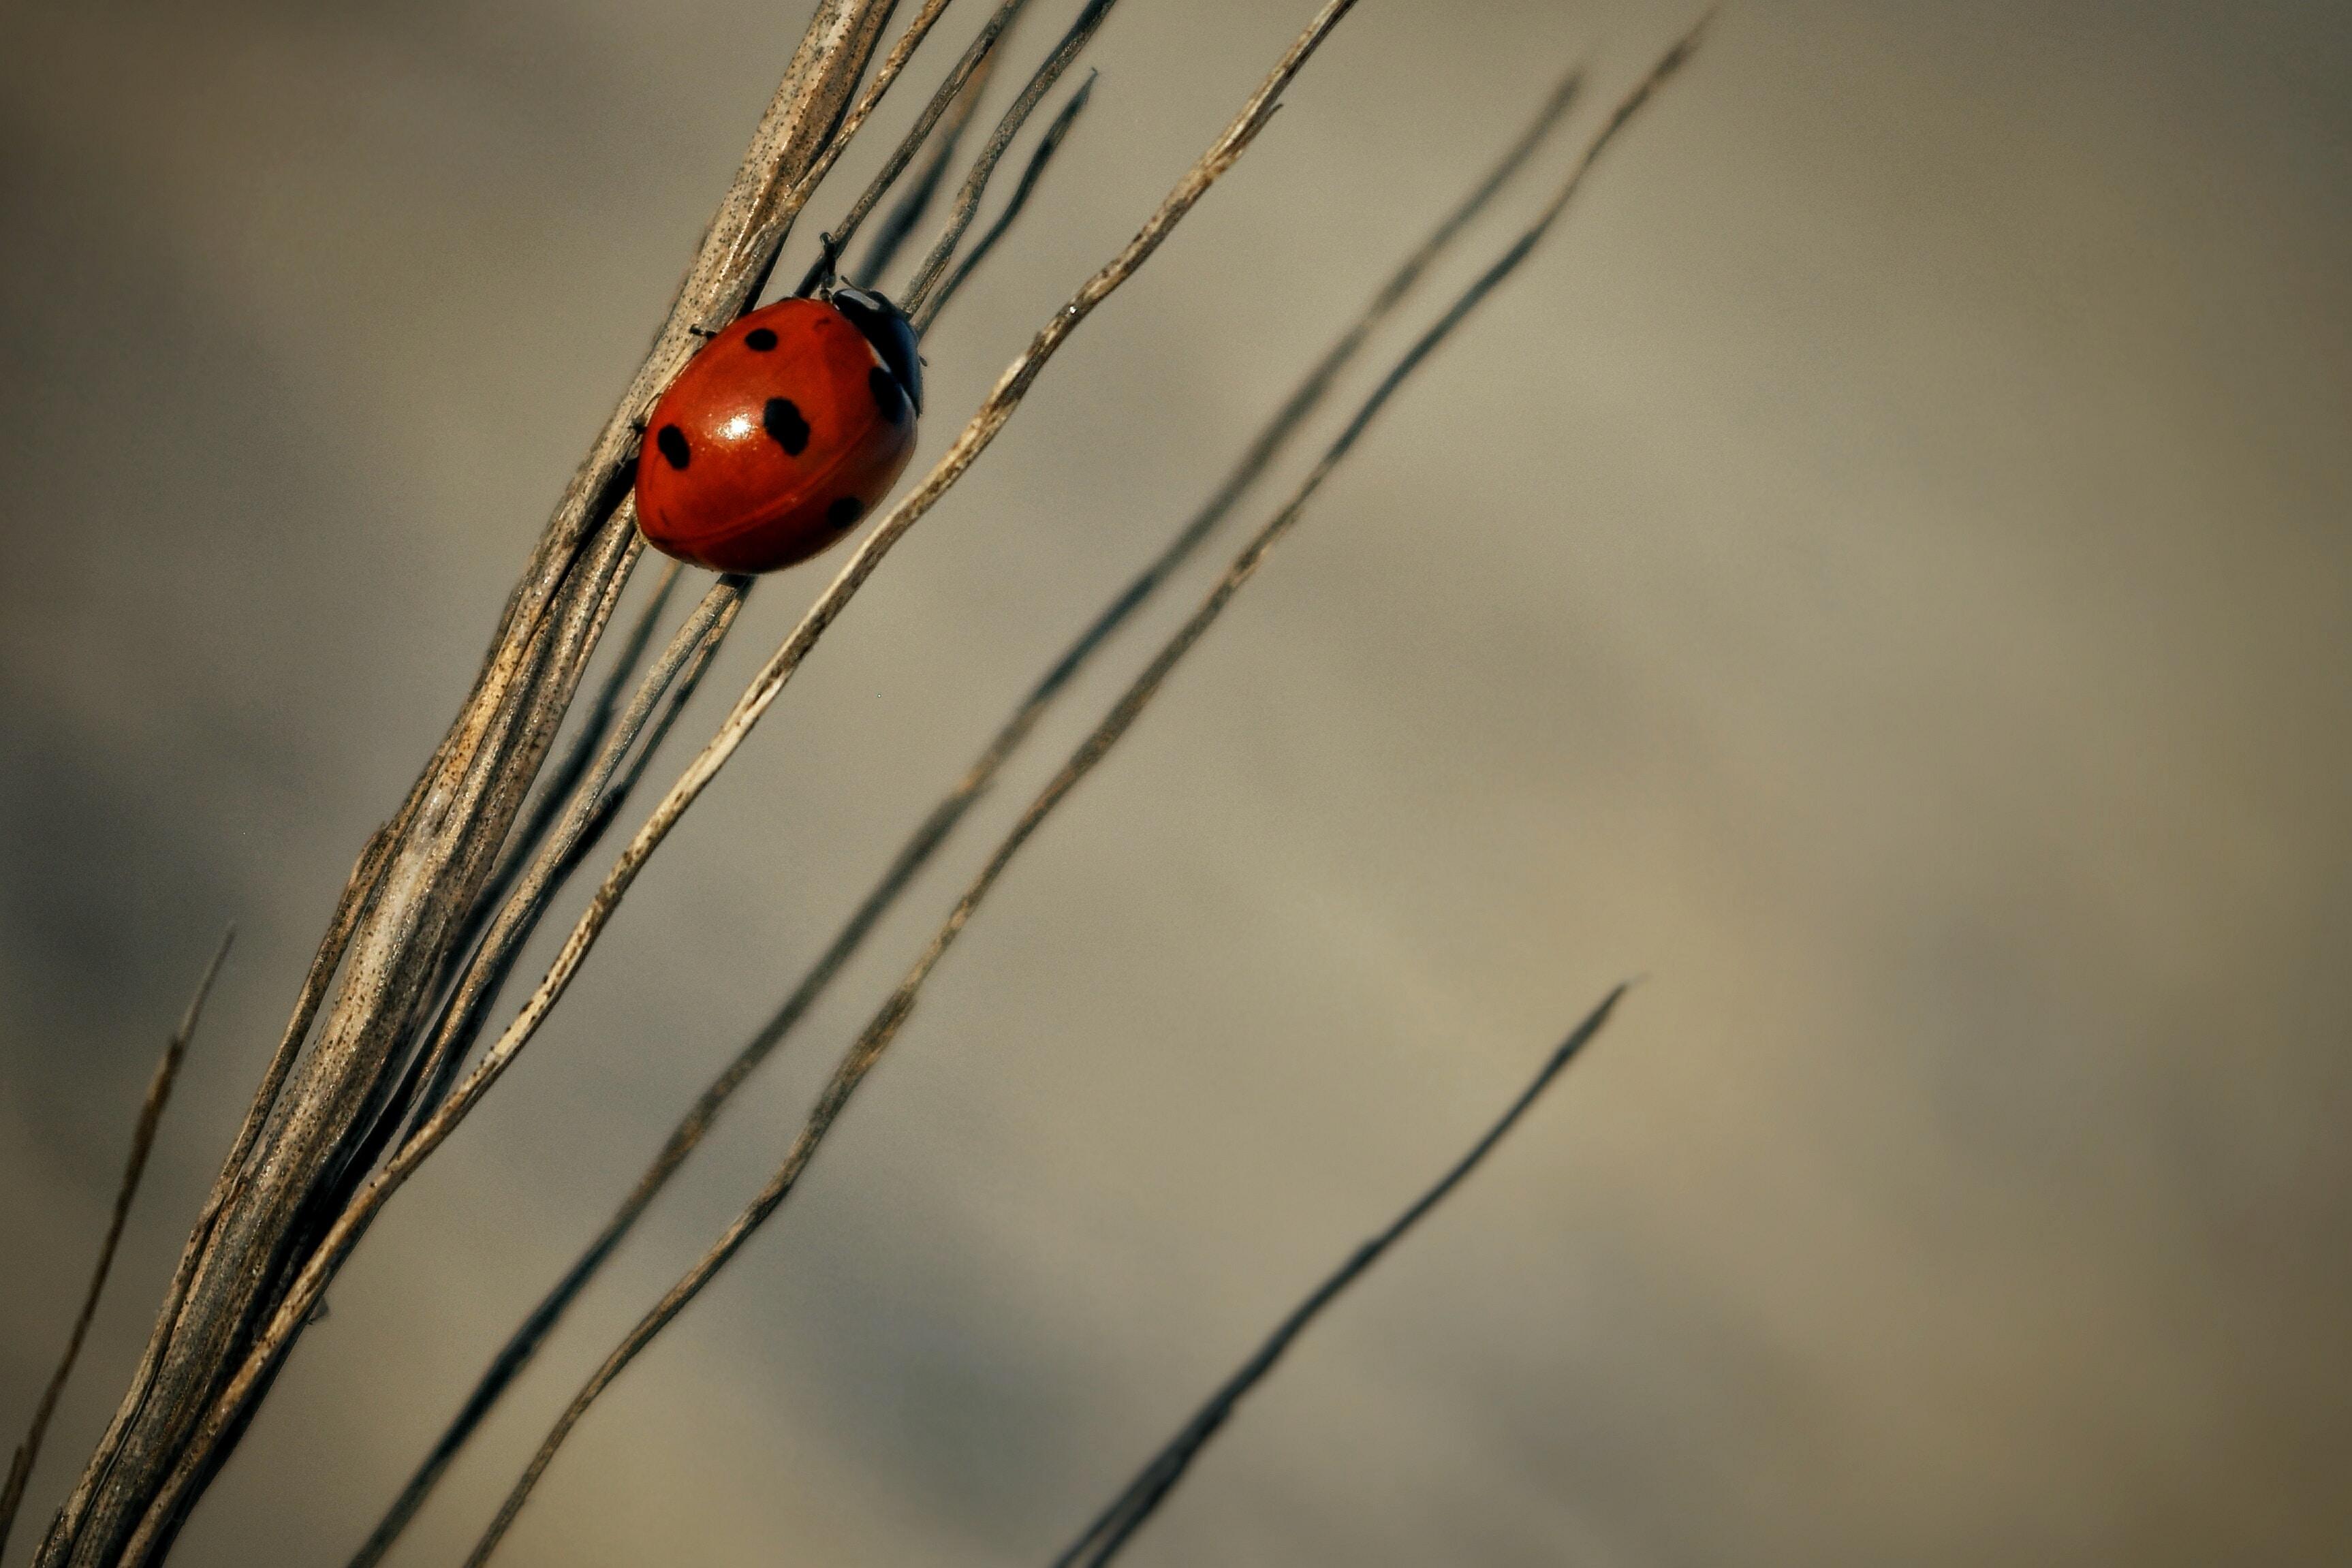 close-up photography of ladybird on grass